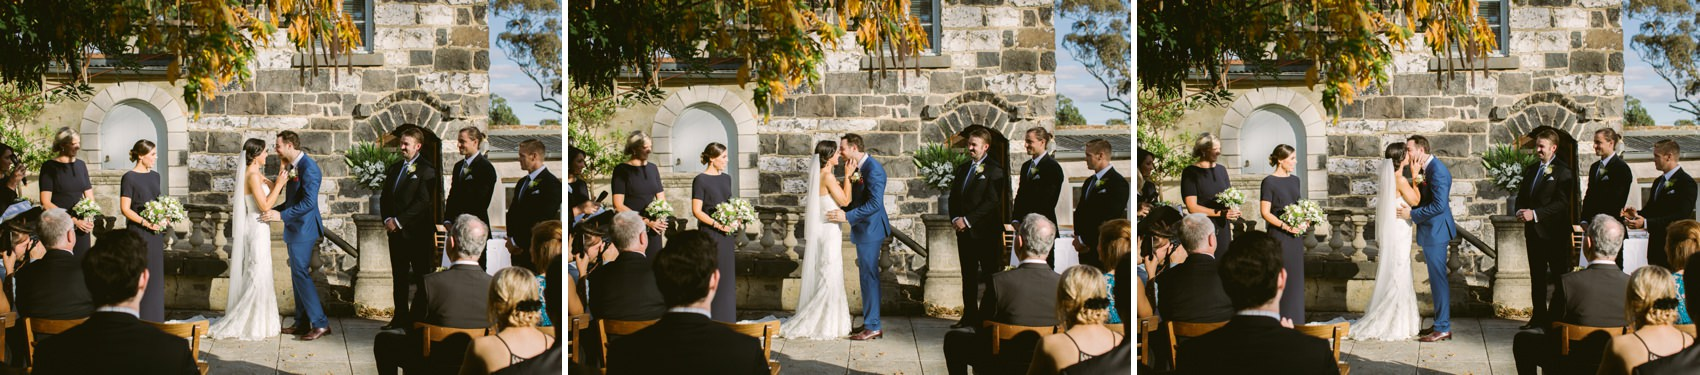 Montsalvat-Wedding-Photography_0142